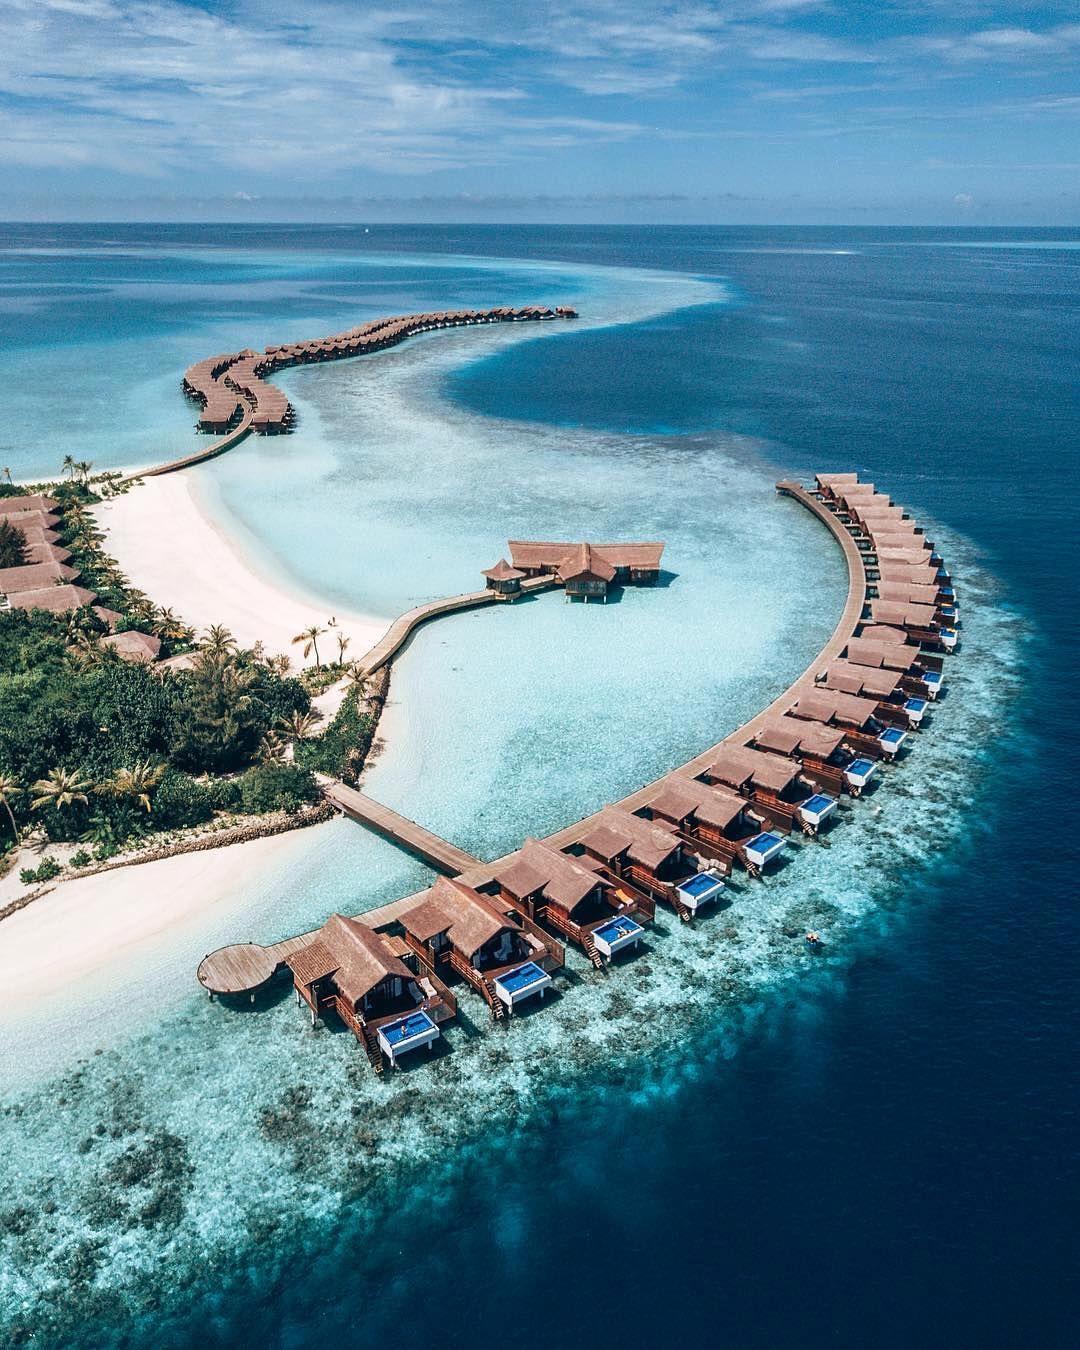 Maldives On Instagram Grand Park Kodhipparu Maldives